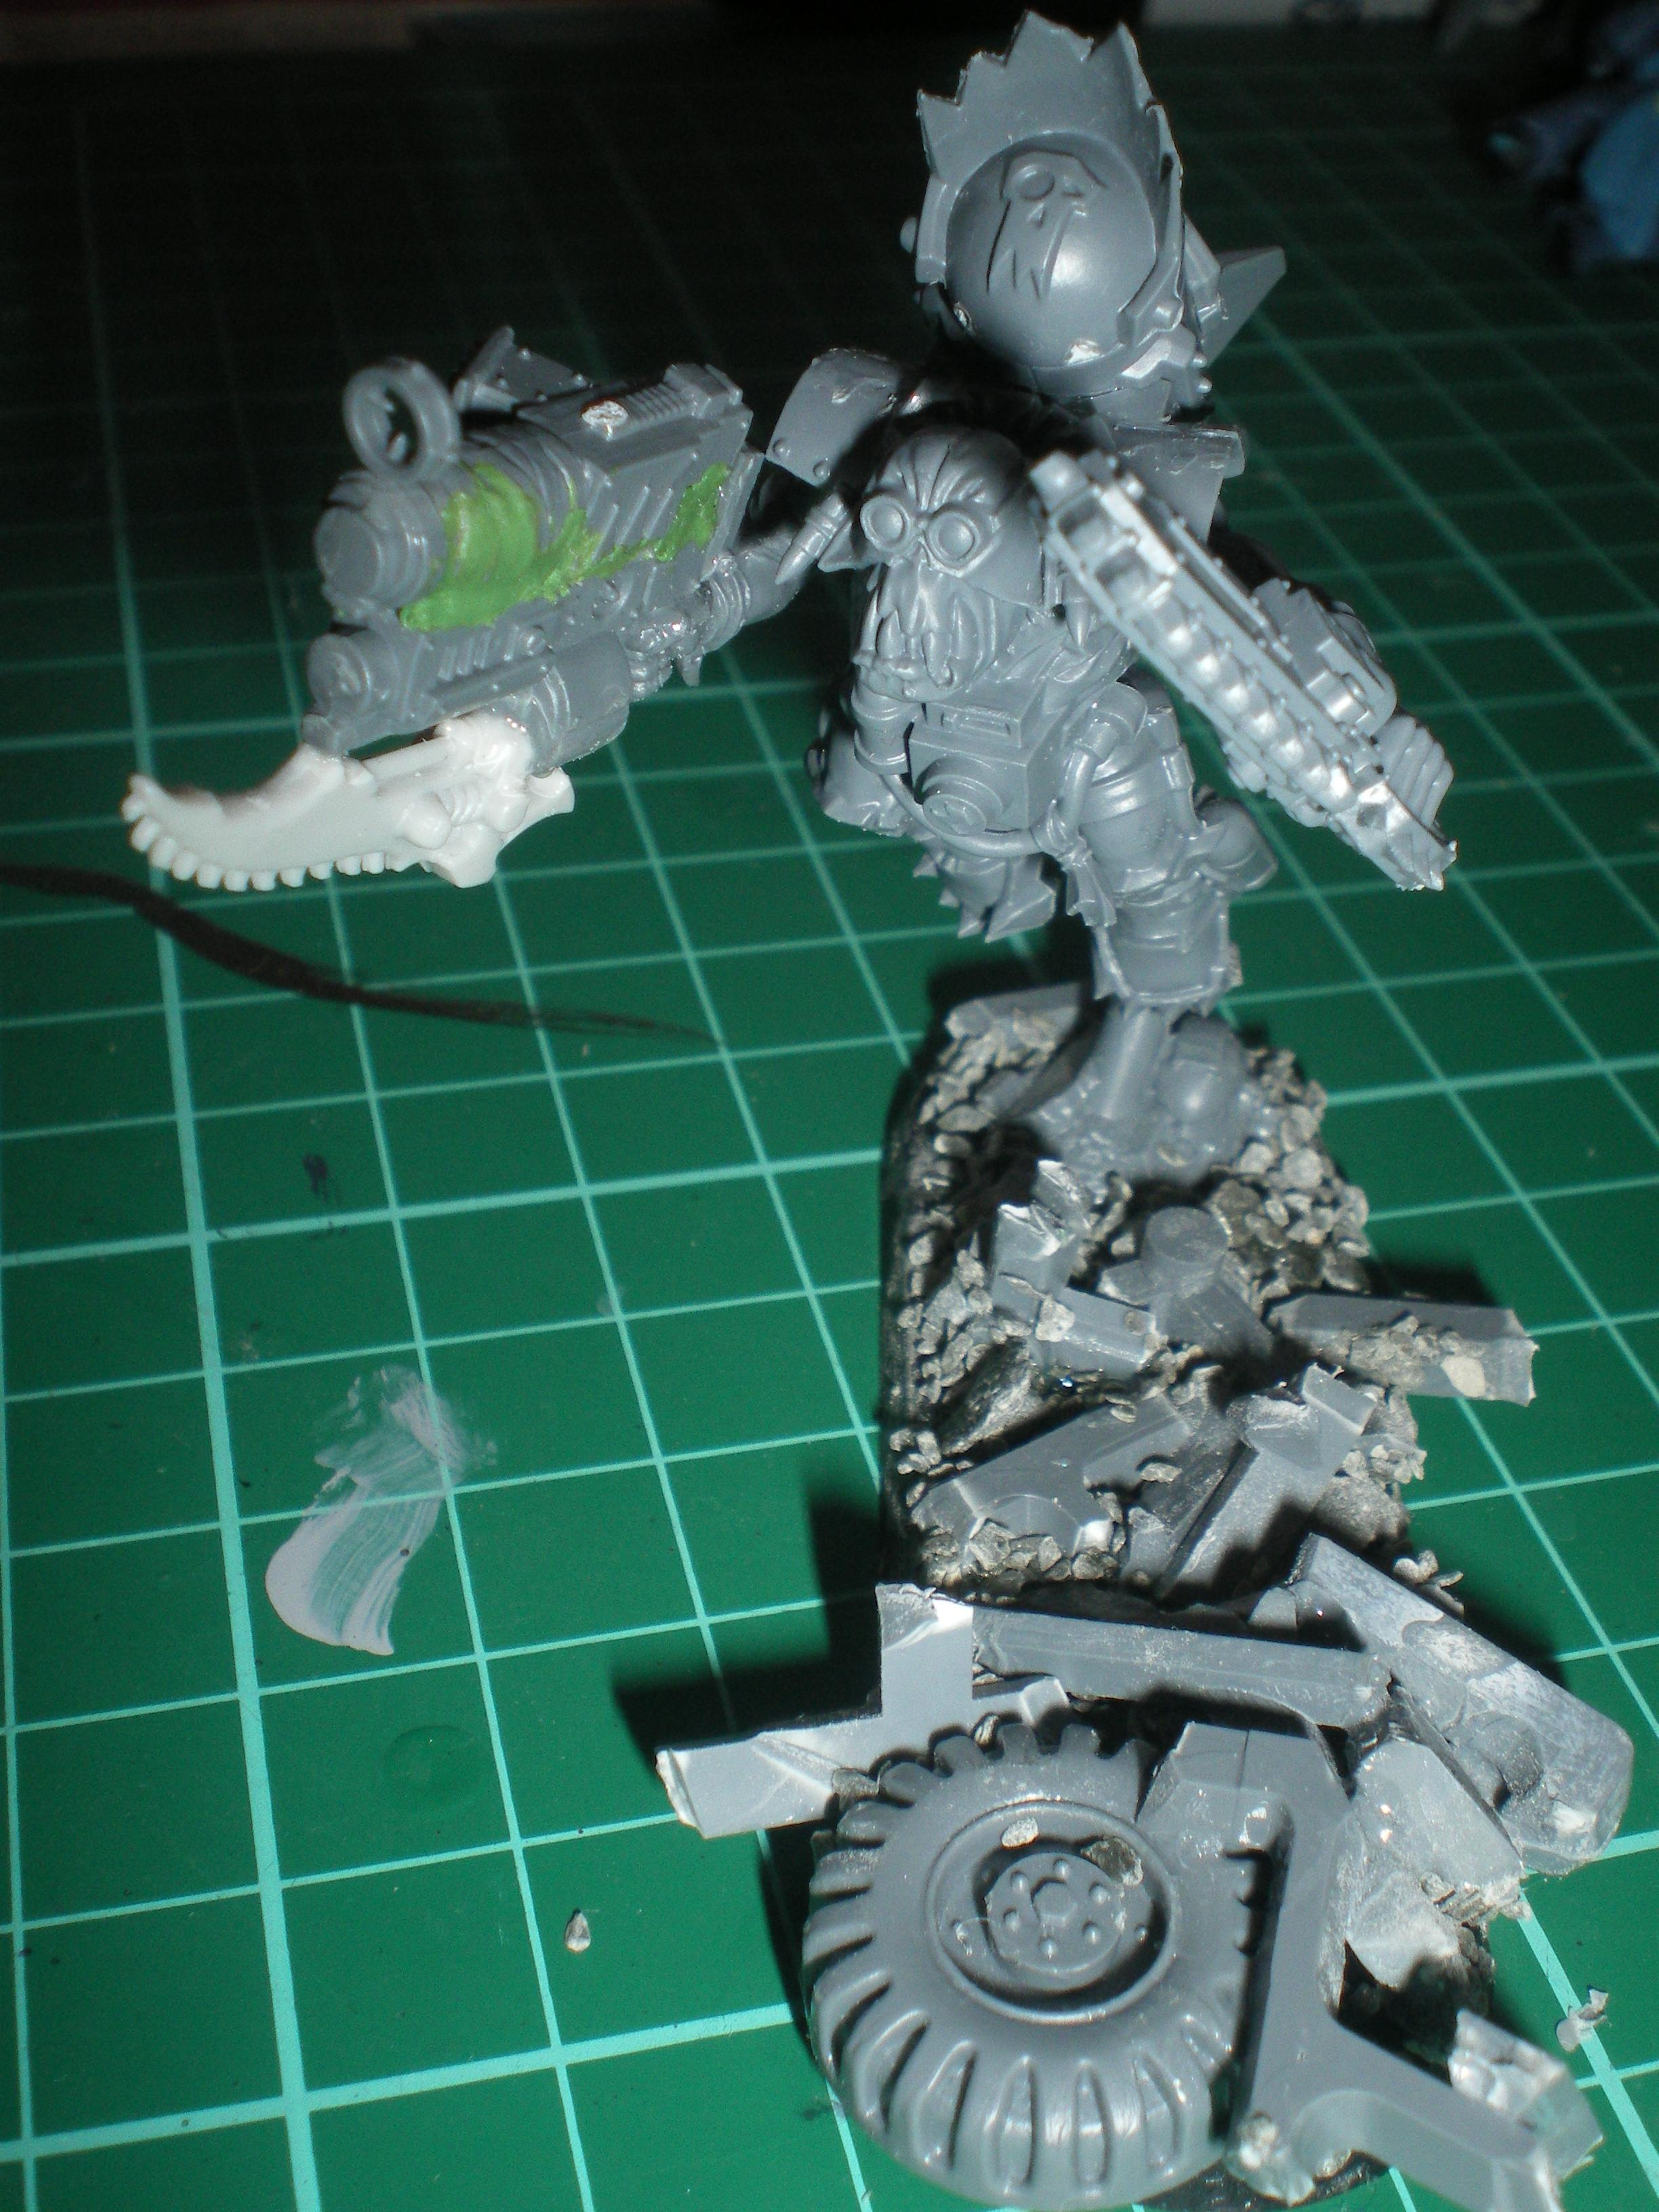 Ork with modified gun